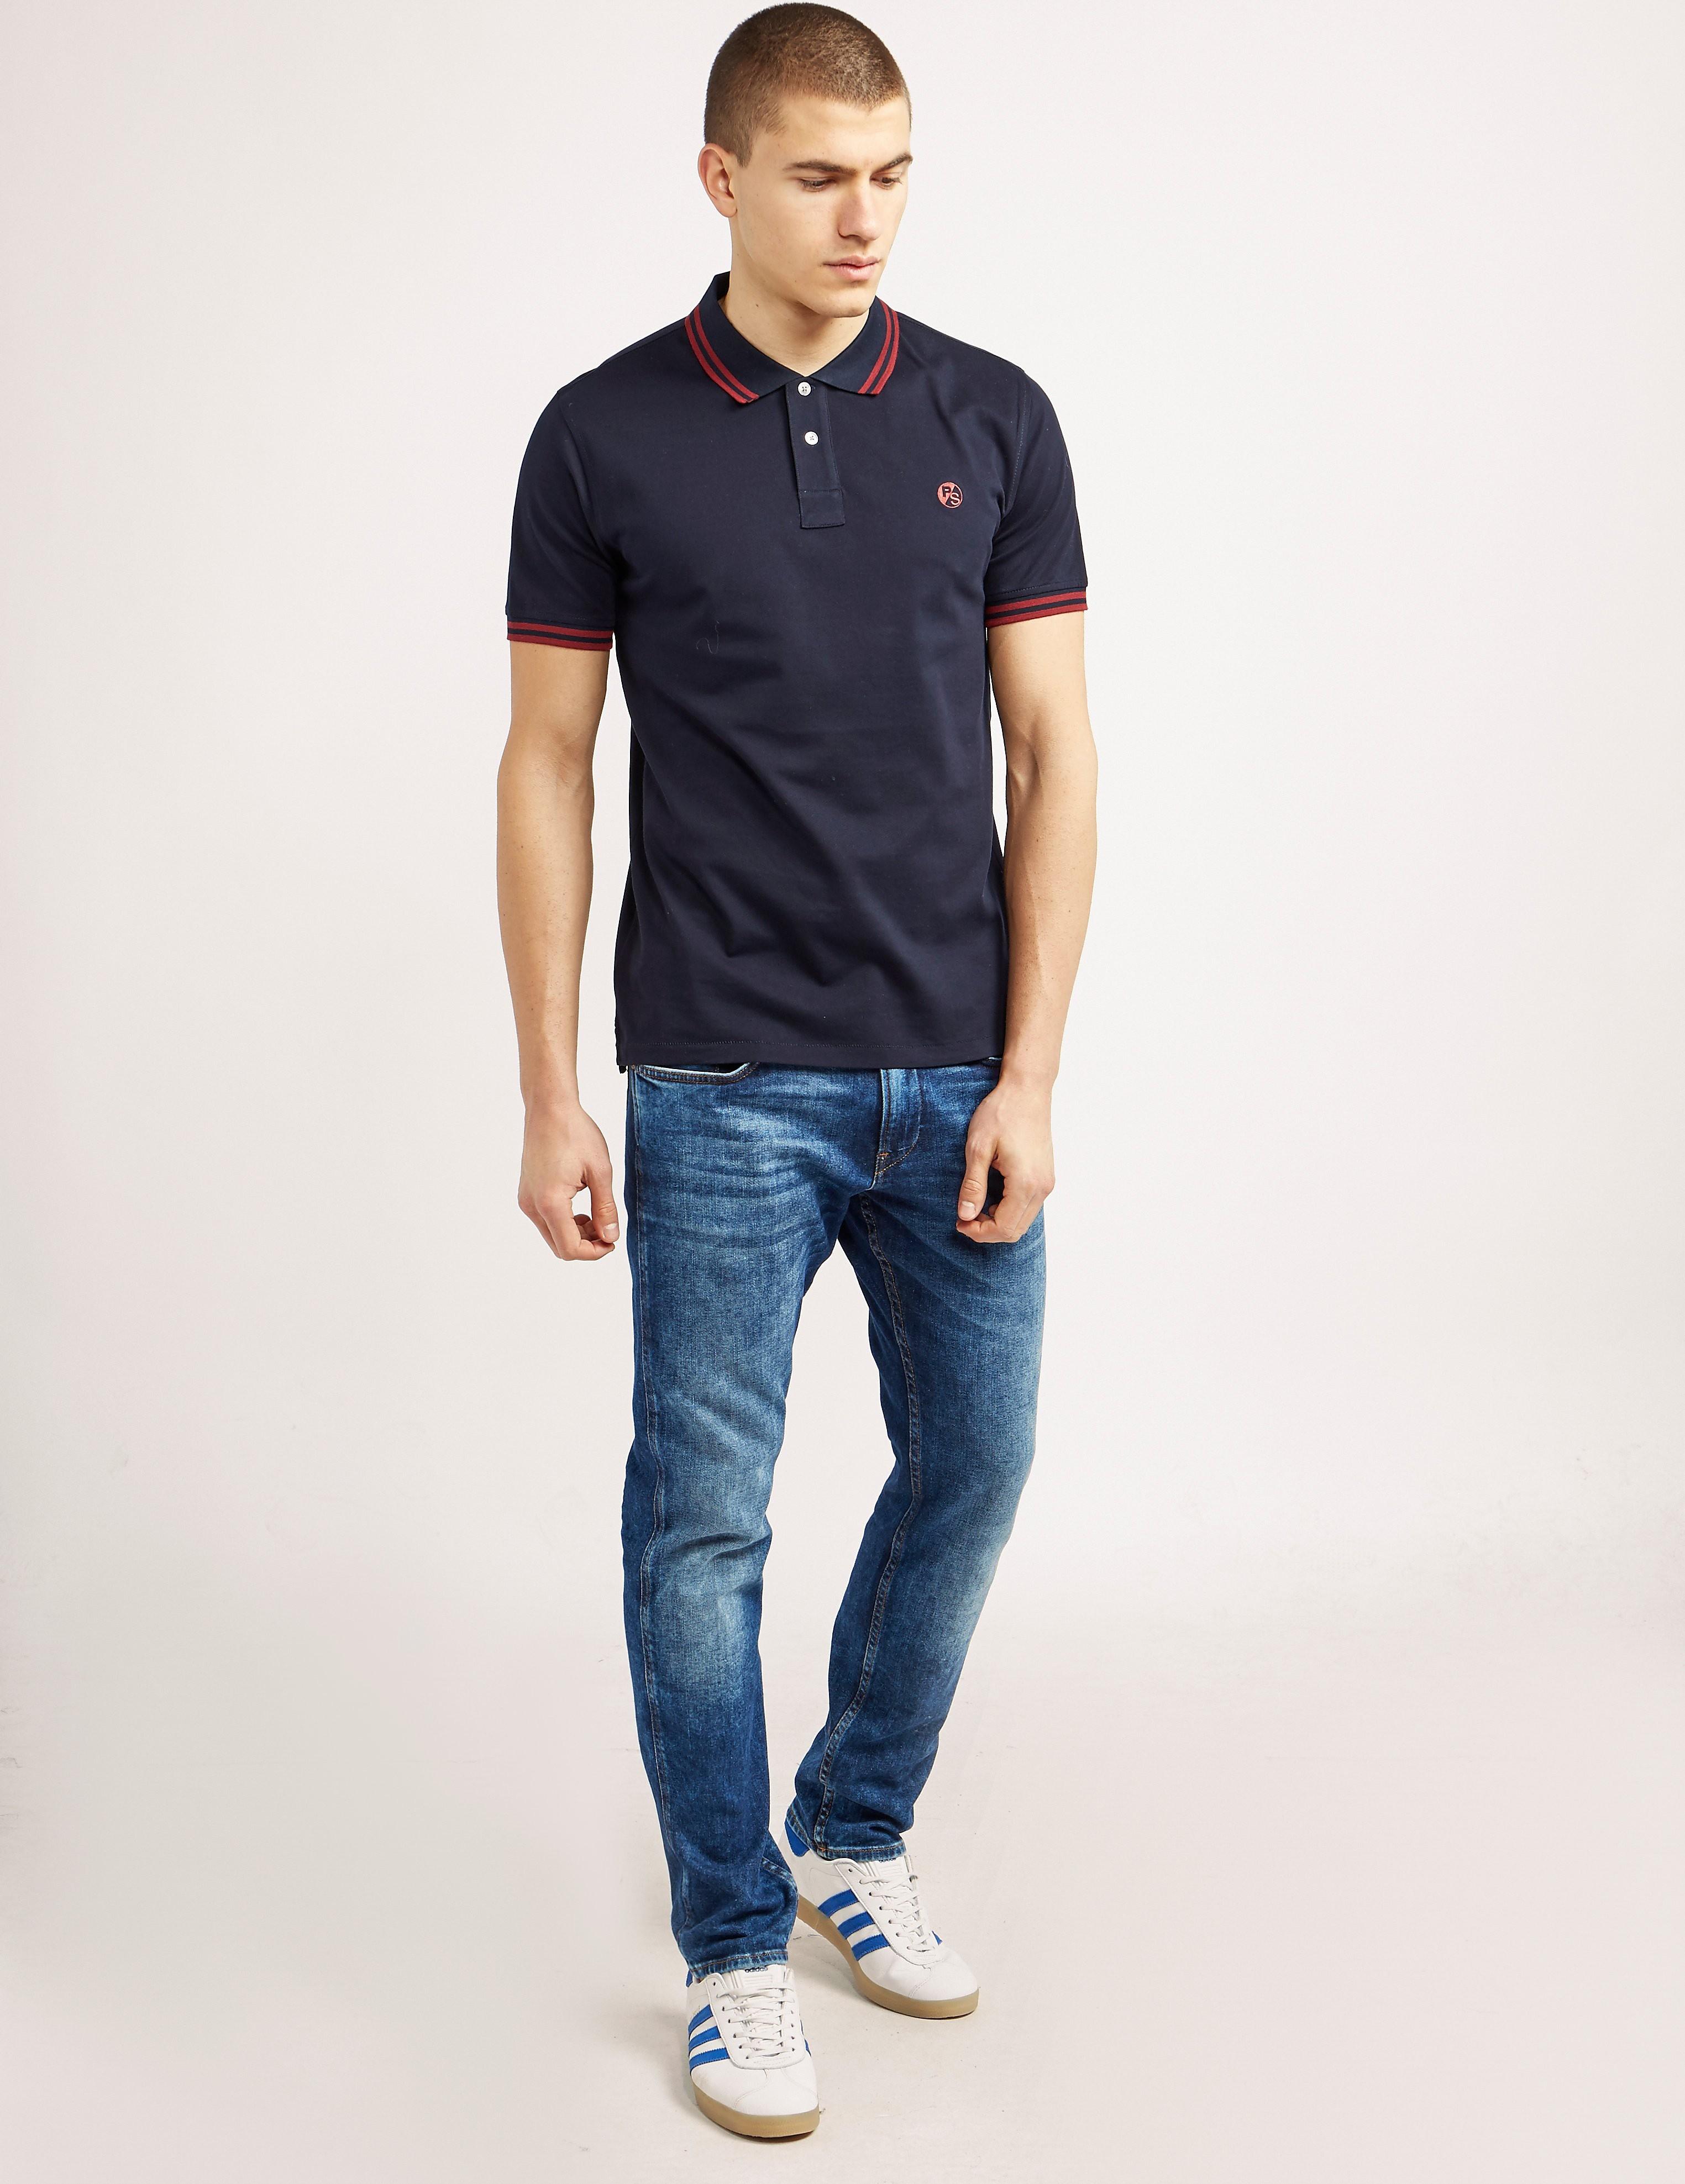 Paul Smith Mercerised Polo Shirt